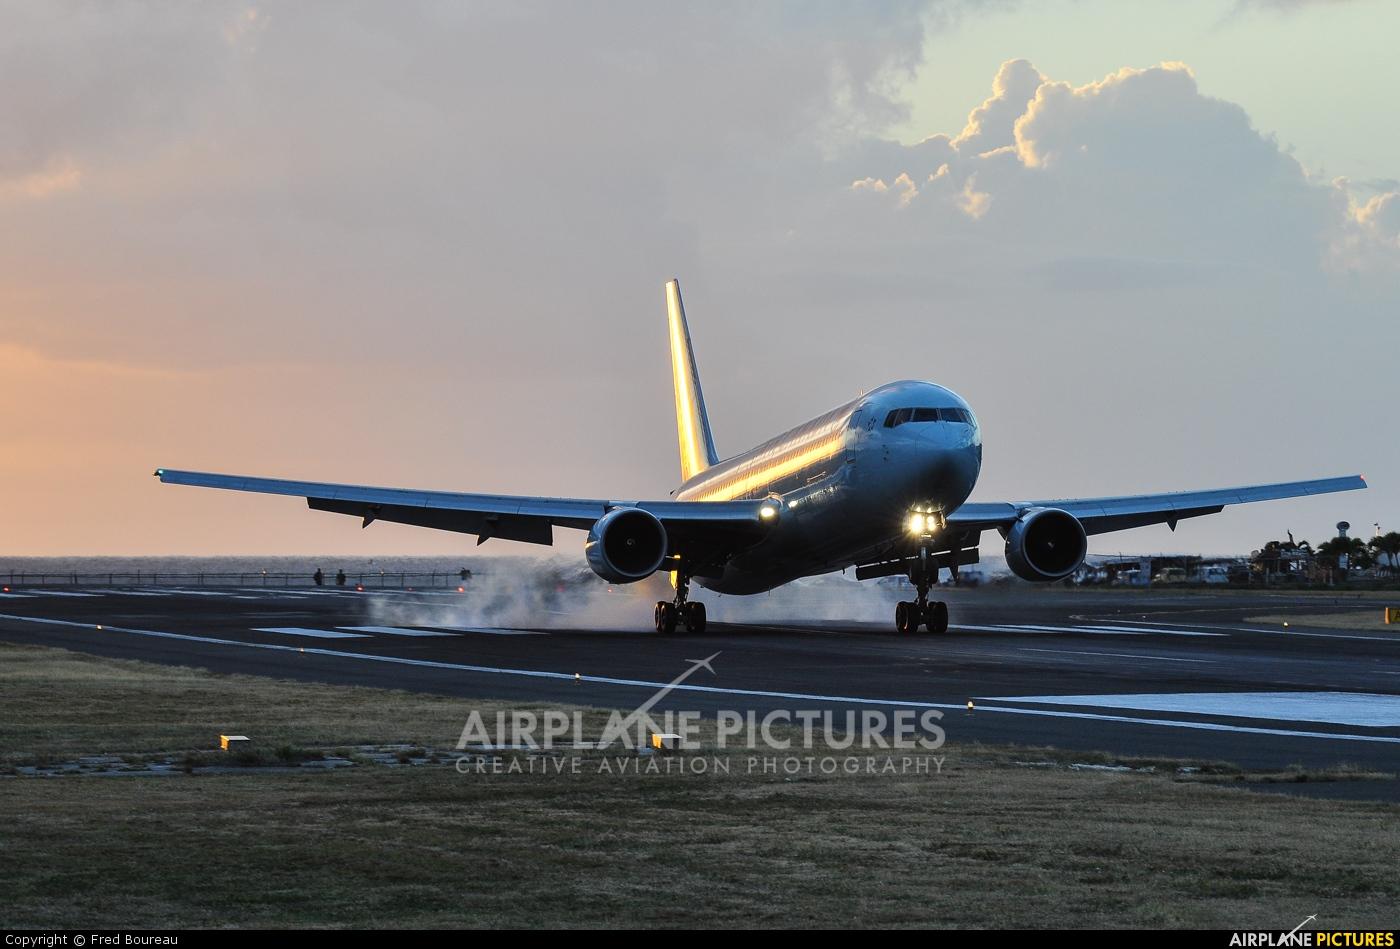 Air Canada C-FMWP aircraft at Sint Maarten - Princess Juliana Intl